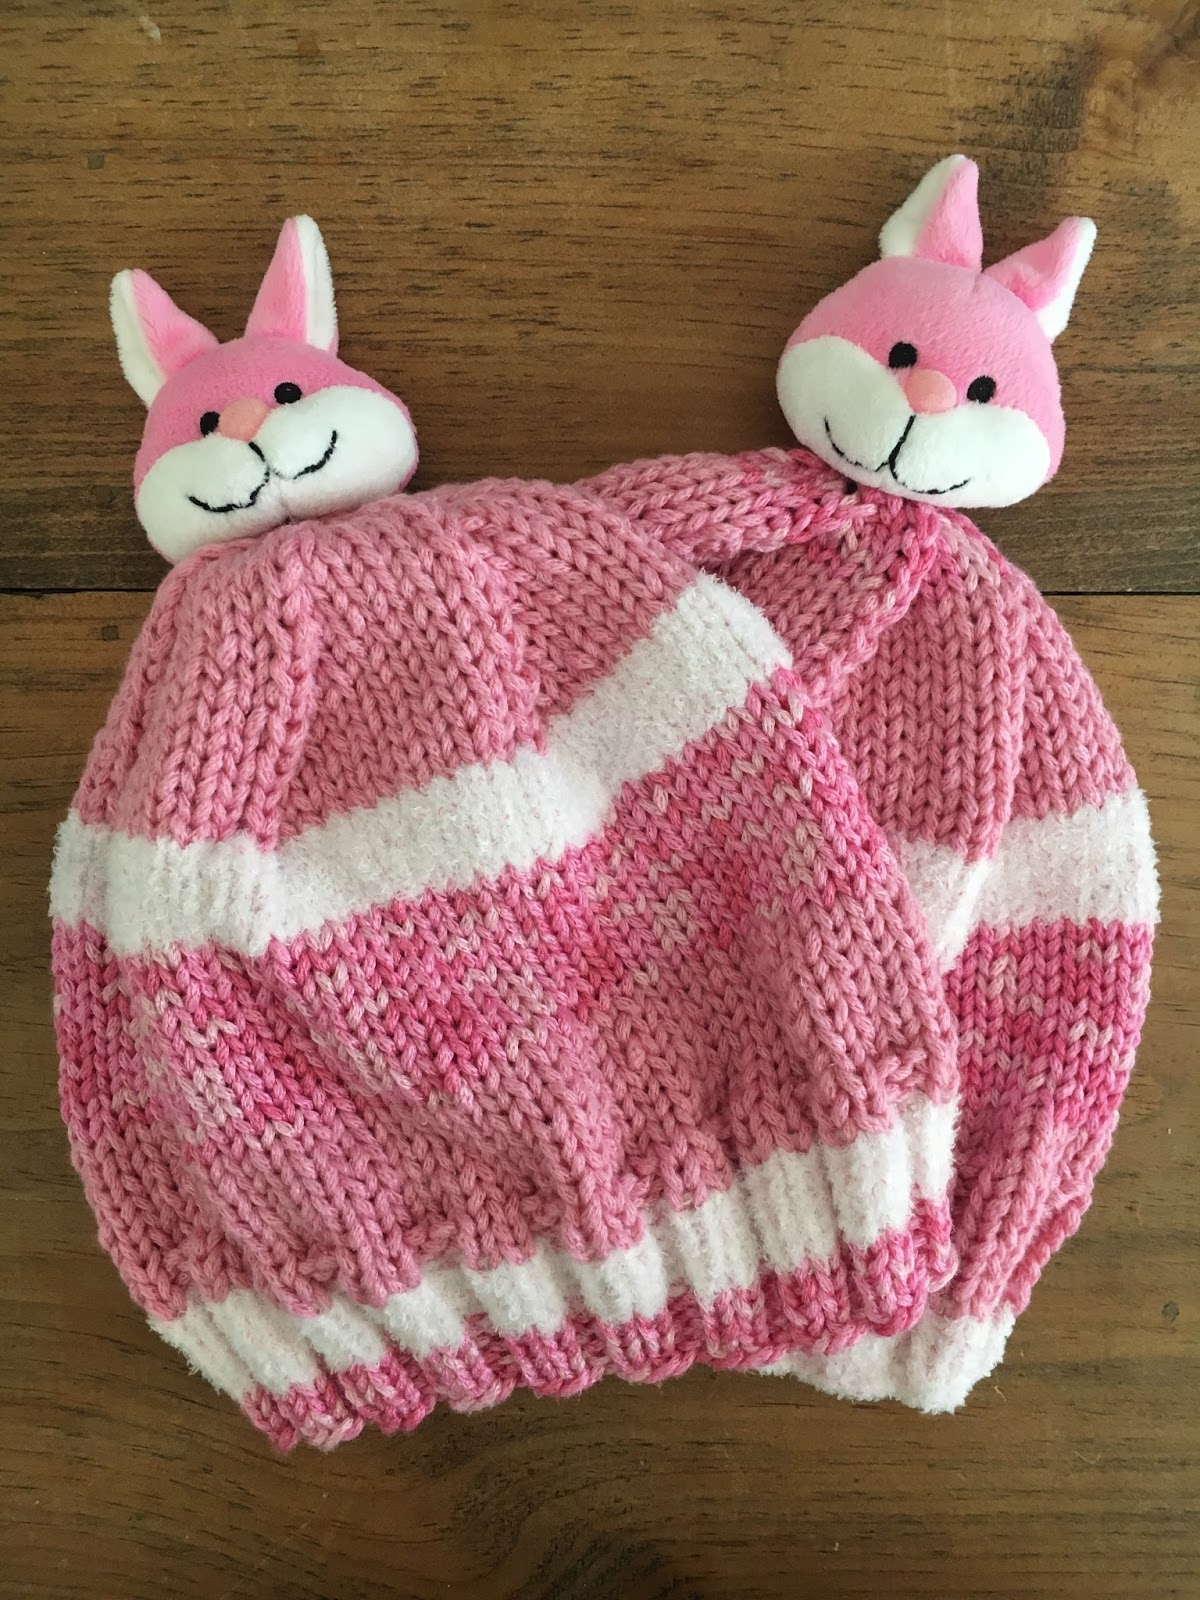 Cookin\' & Craftin\': Knitting: Bunny Hats